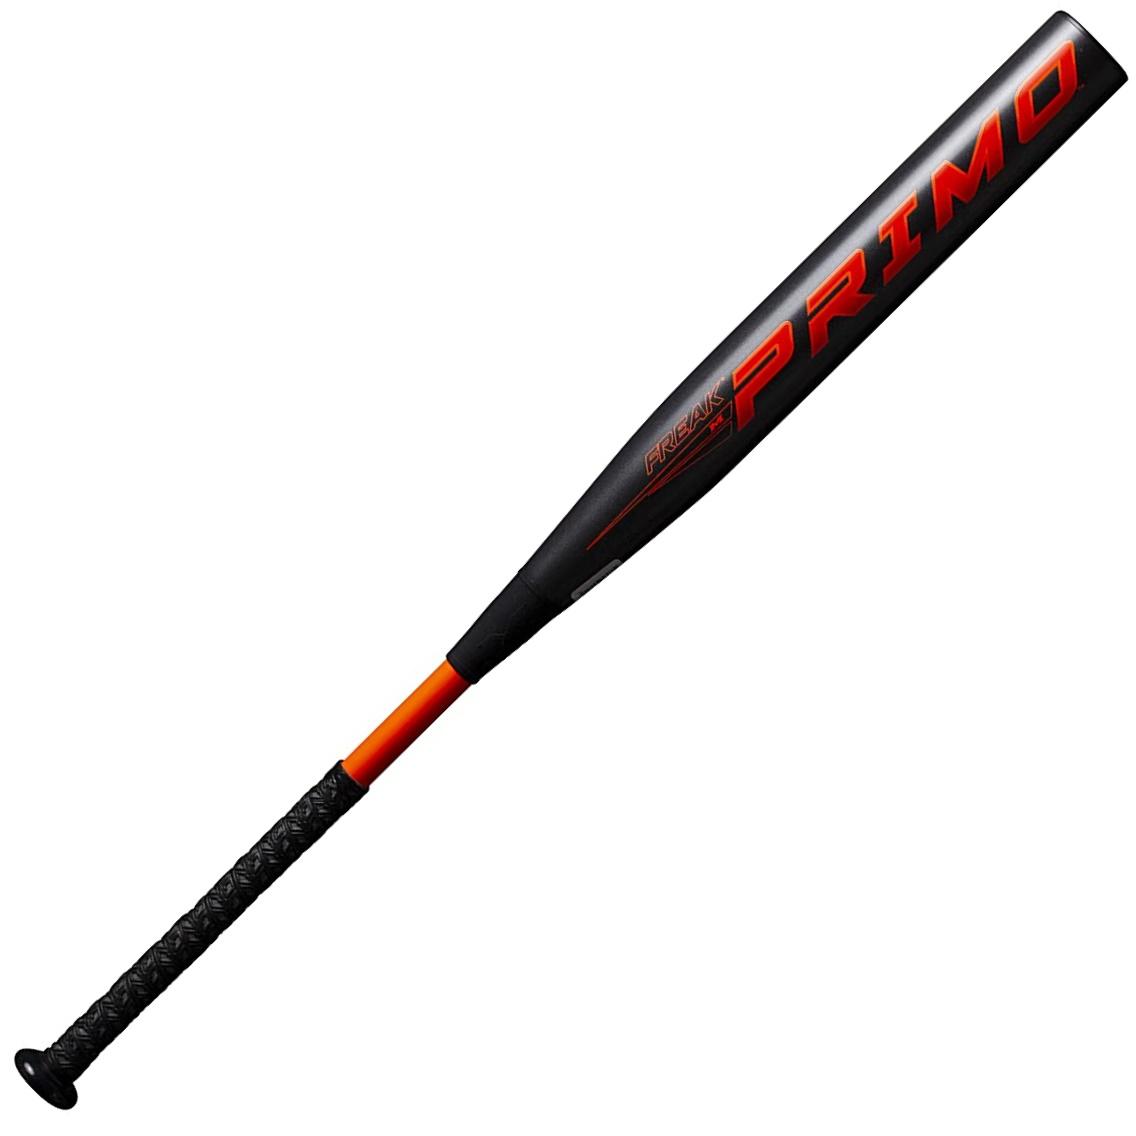 miken-freak-primo-14-usa-asa-maxload-slowpitch-softball-bat-34-inch-26-oz MP21MA-3-26 Miken